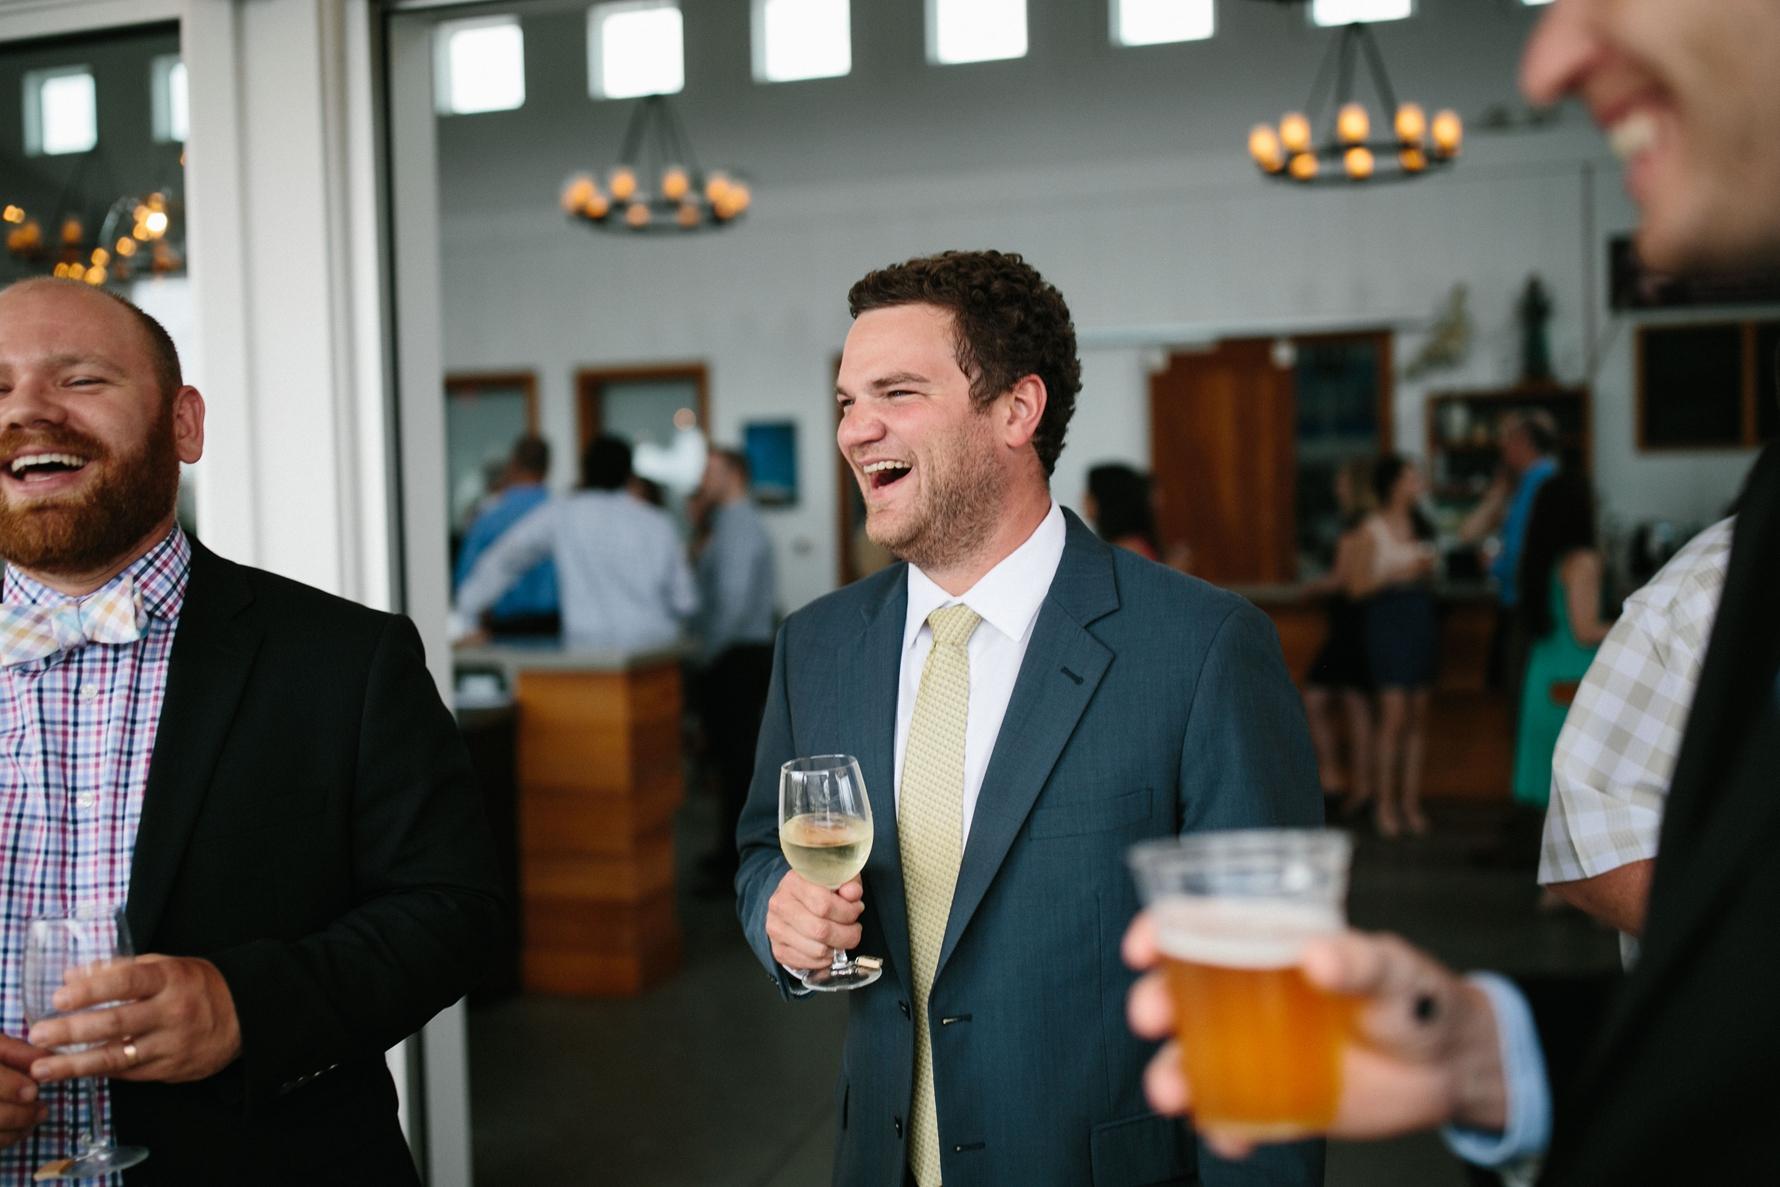 Anderson Wedding 084.JPG